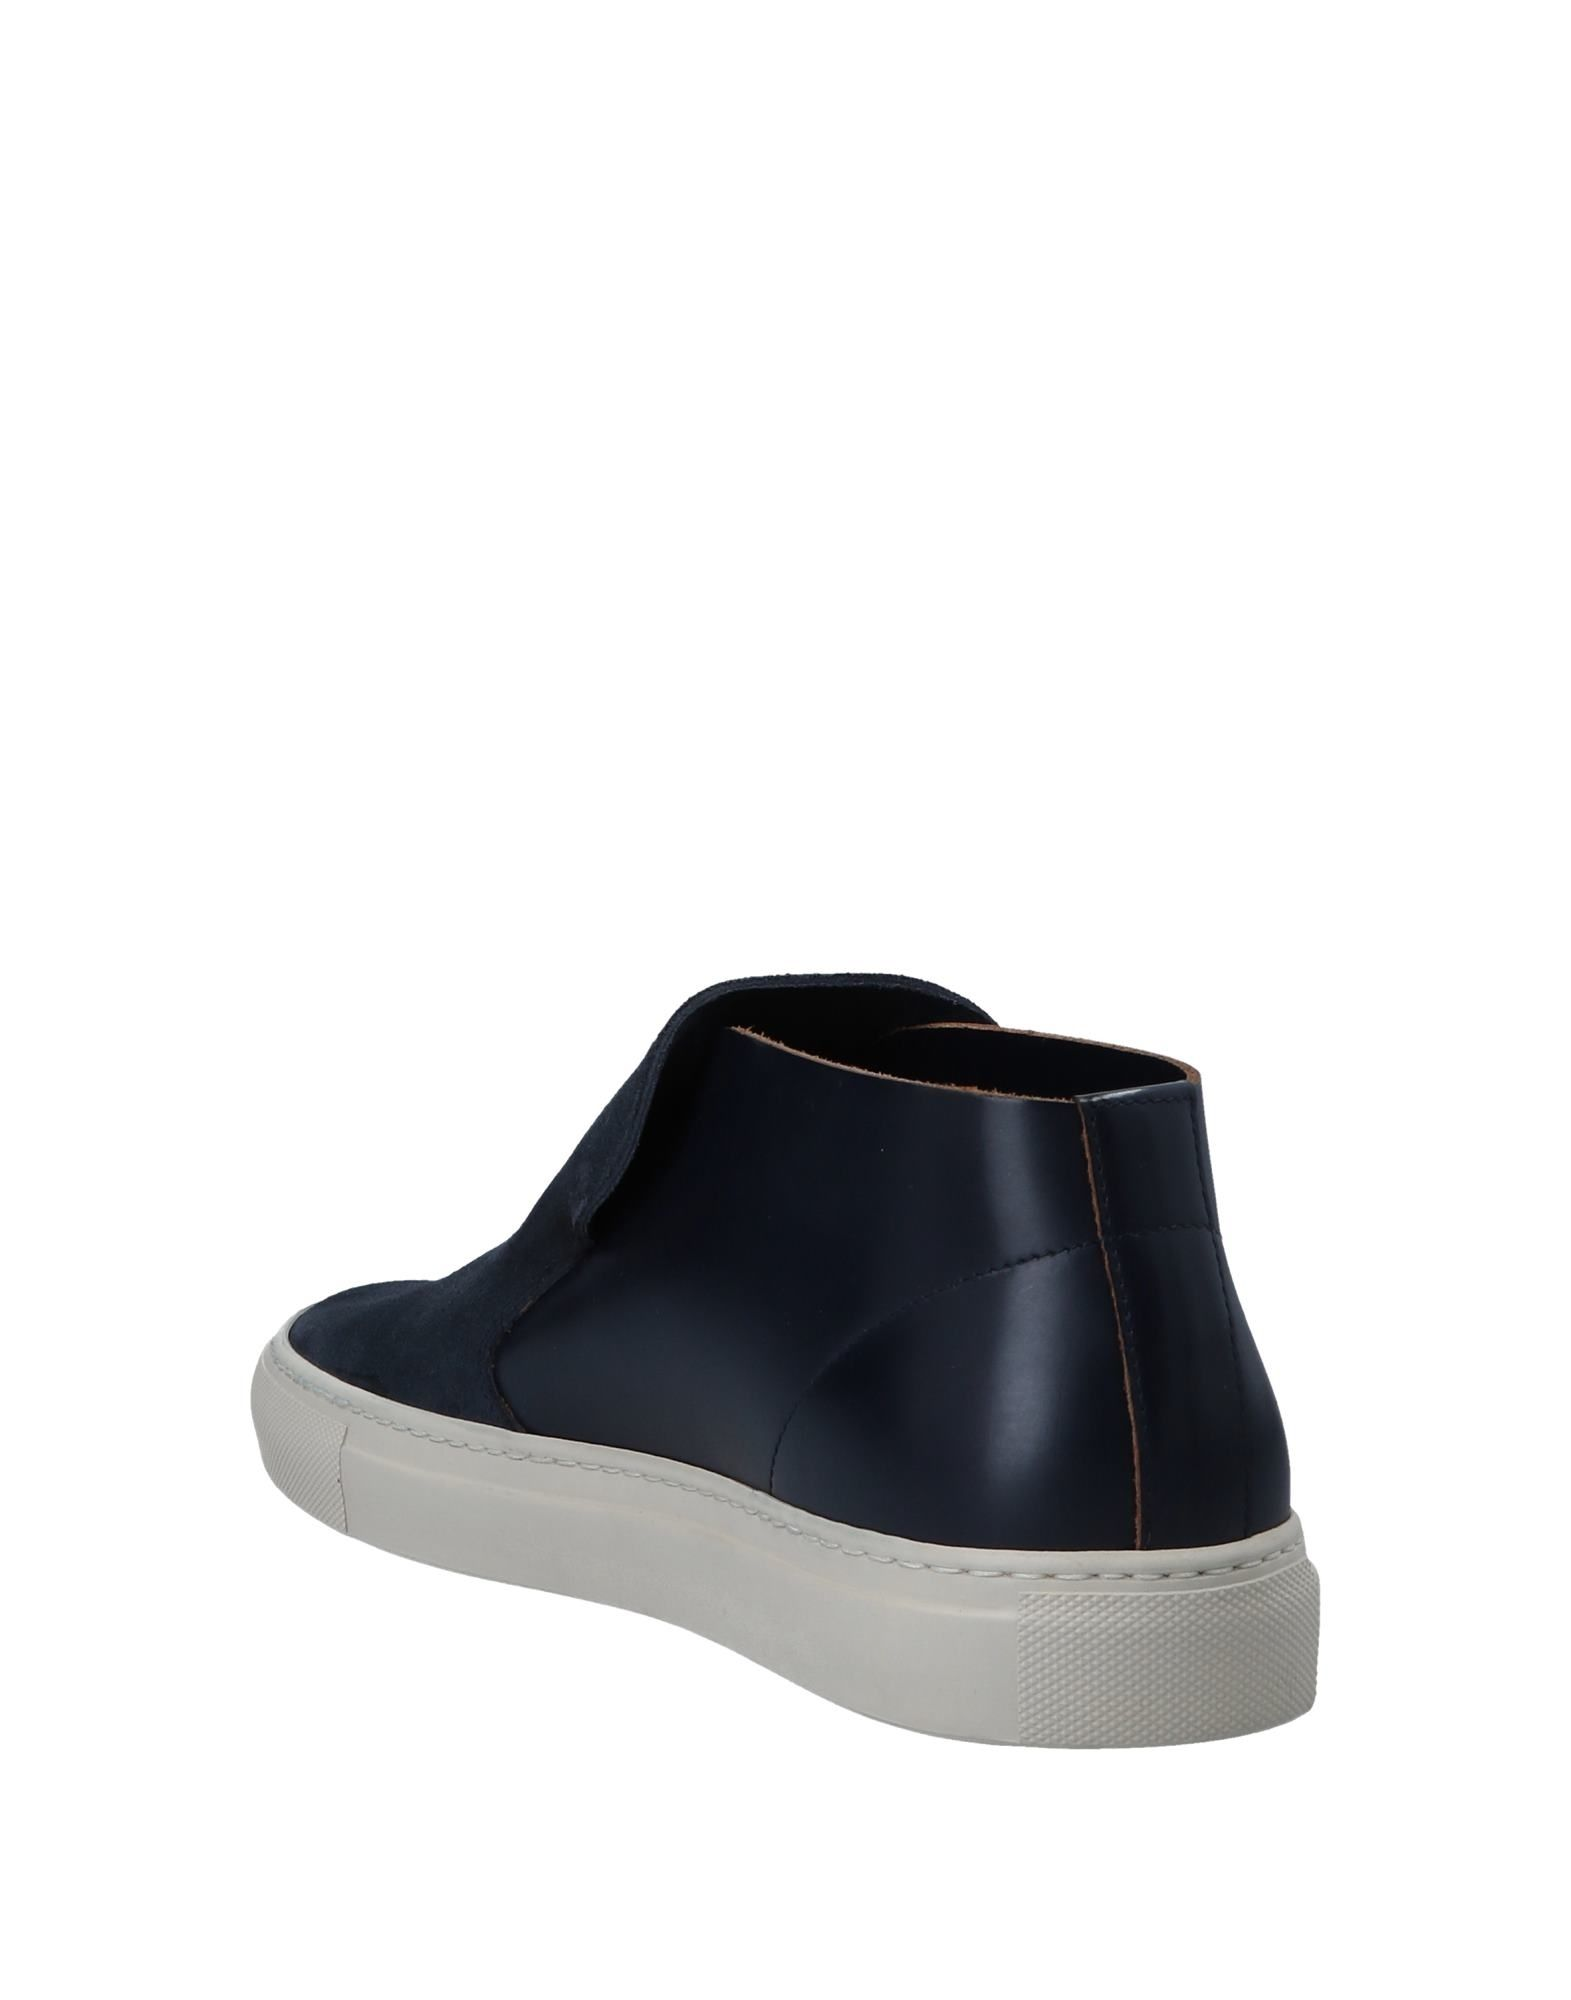 Buttero® Sneakers Herren  11553377PO Schuhe Gute Qualität beliebte Schuhe 11553377PO a456e9